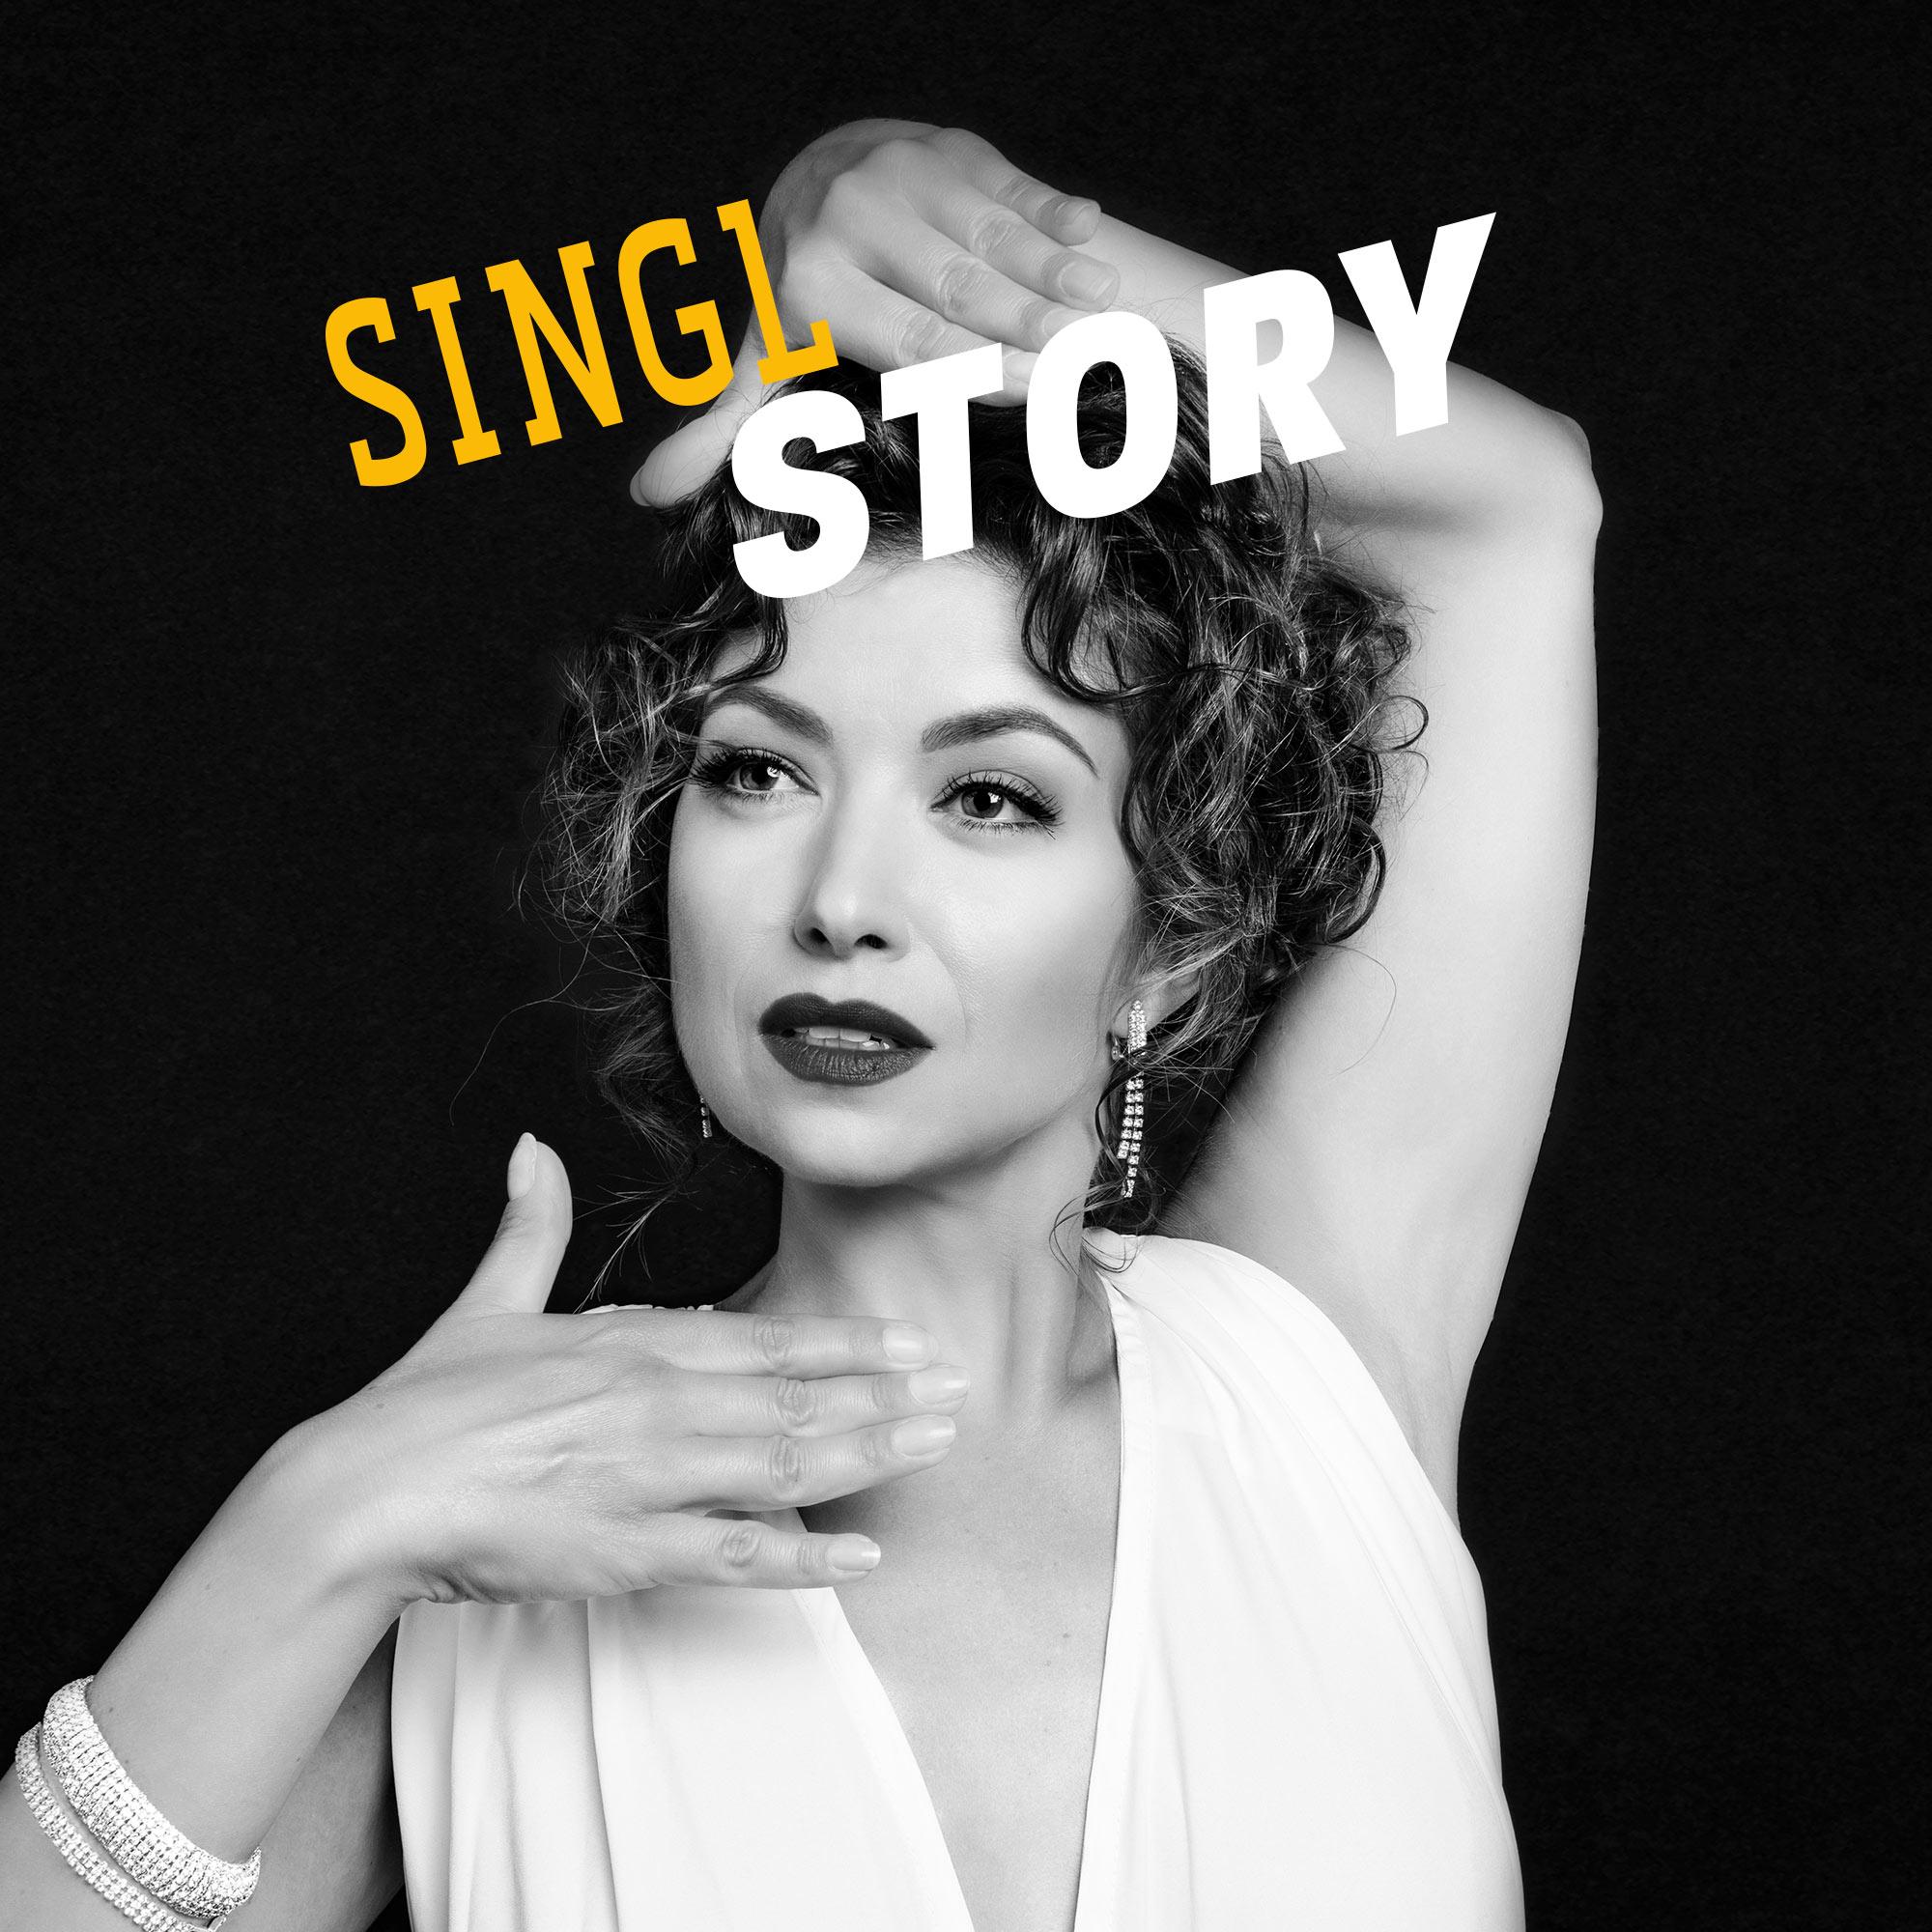 7. SinglStory